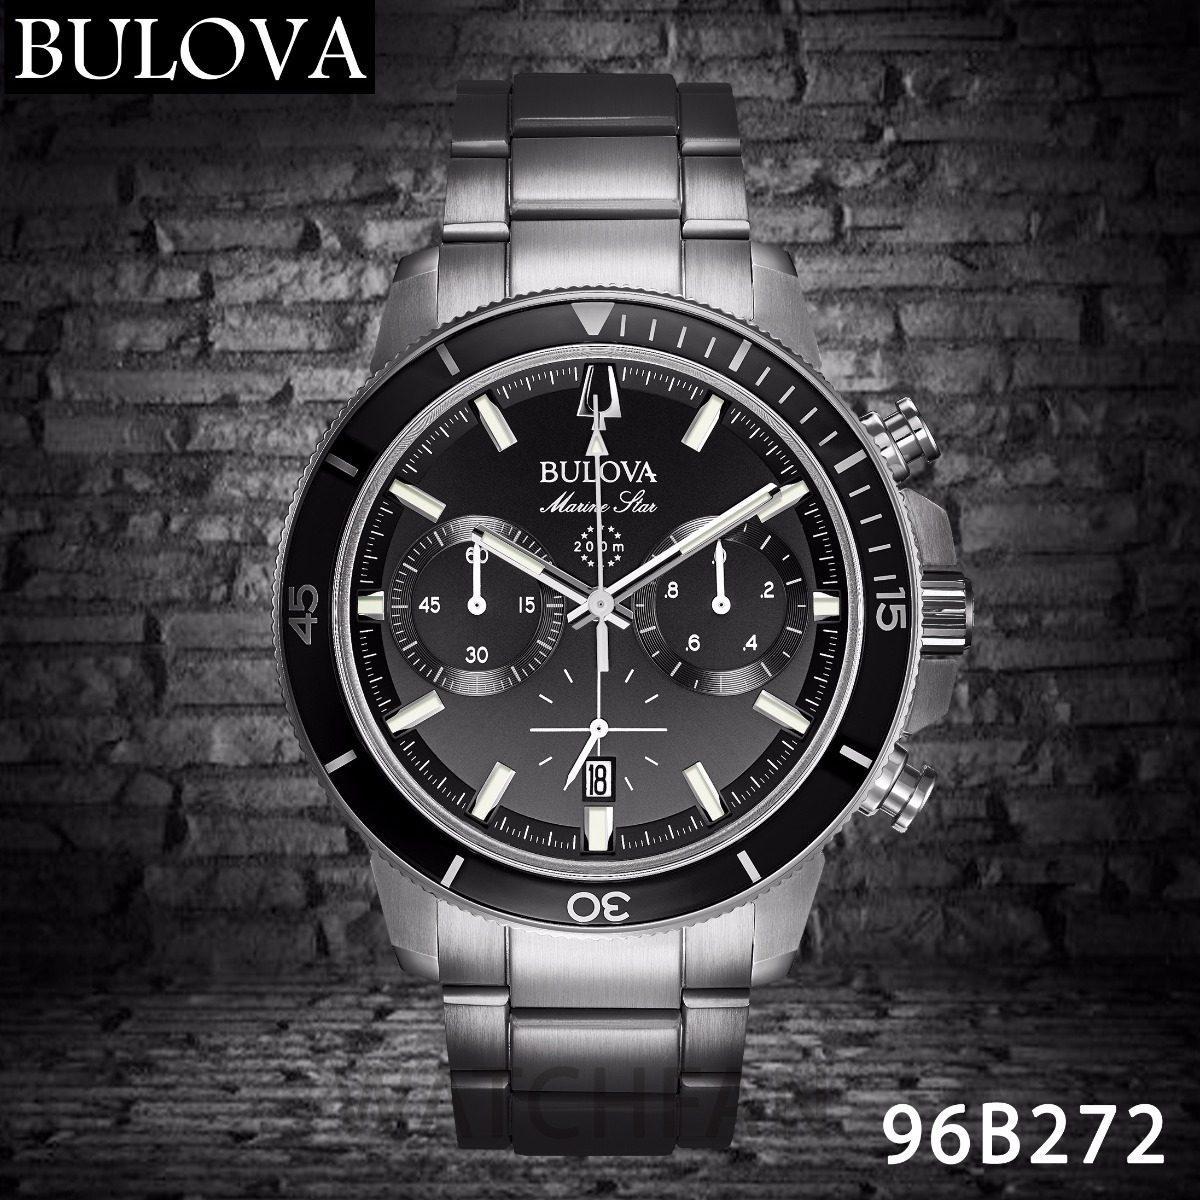 Reloj Bulova 96b272 Cronografo Marine Star Black 200m Wr - $ 28.495 ...